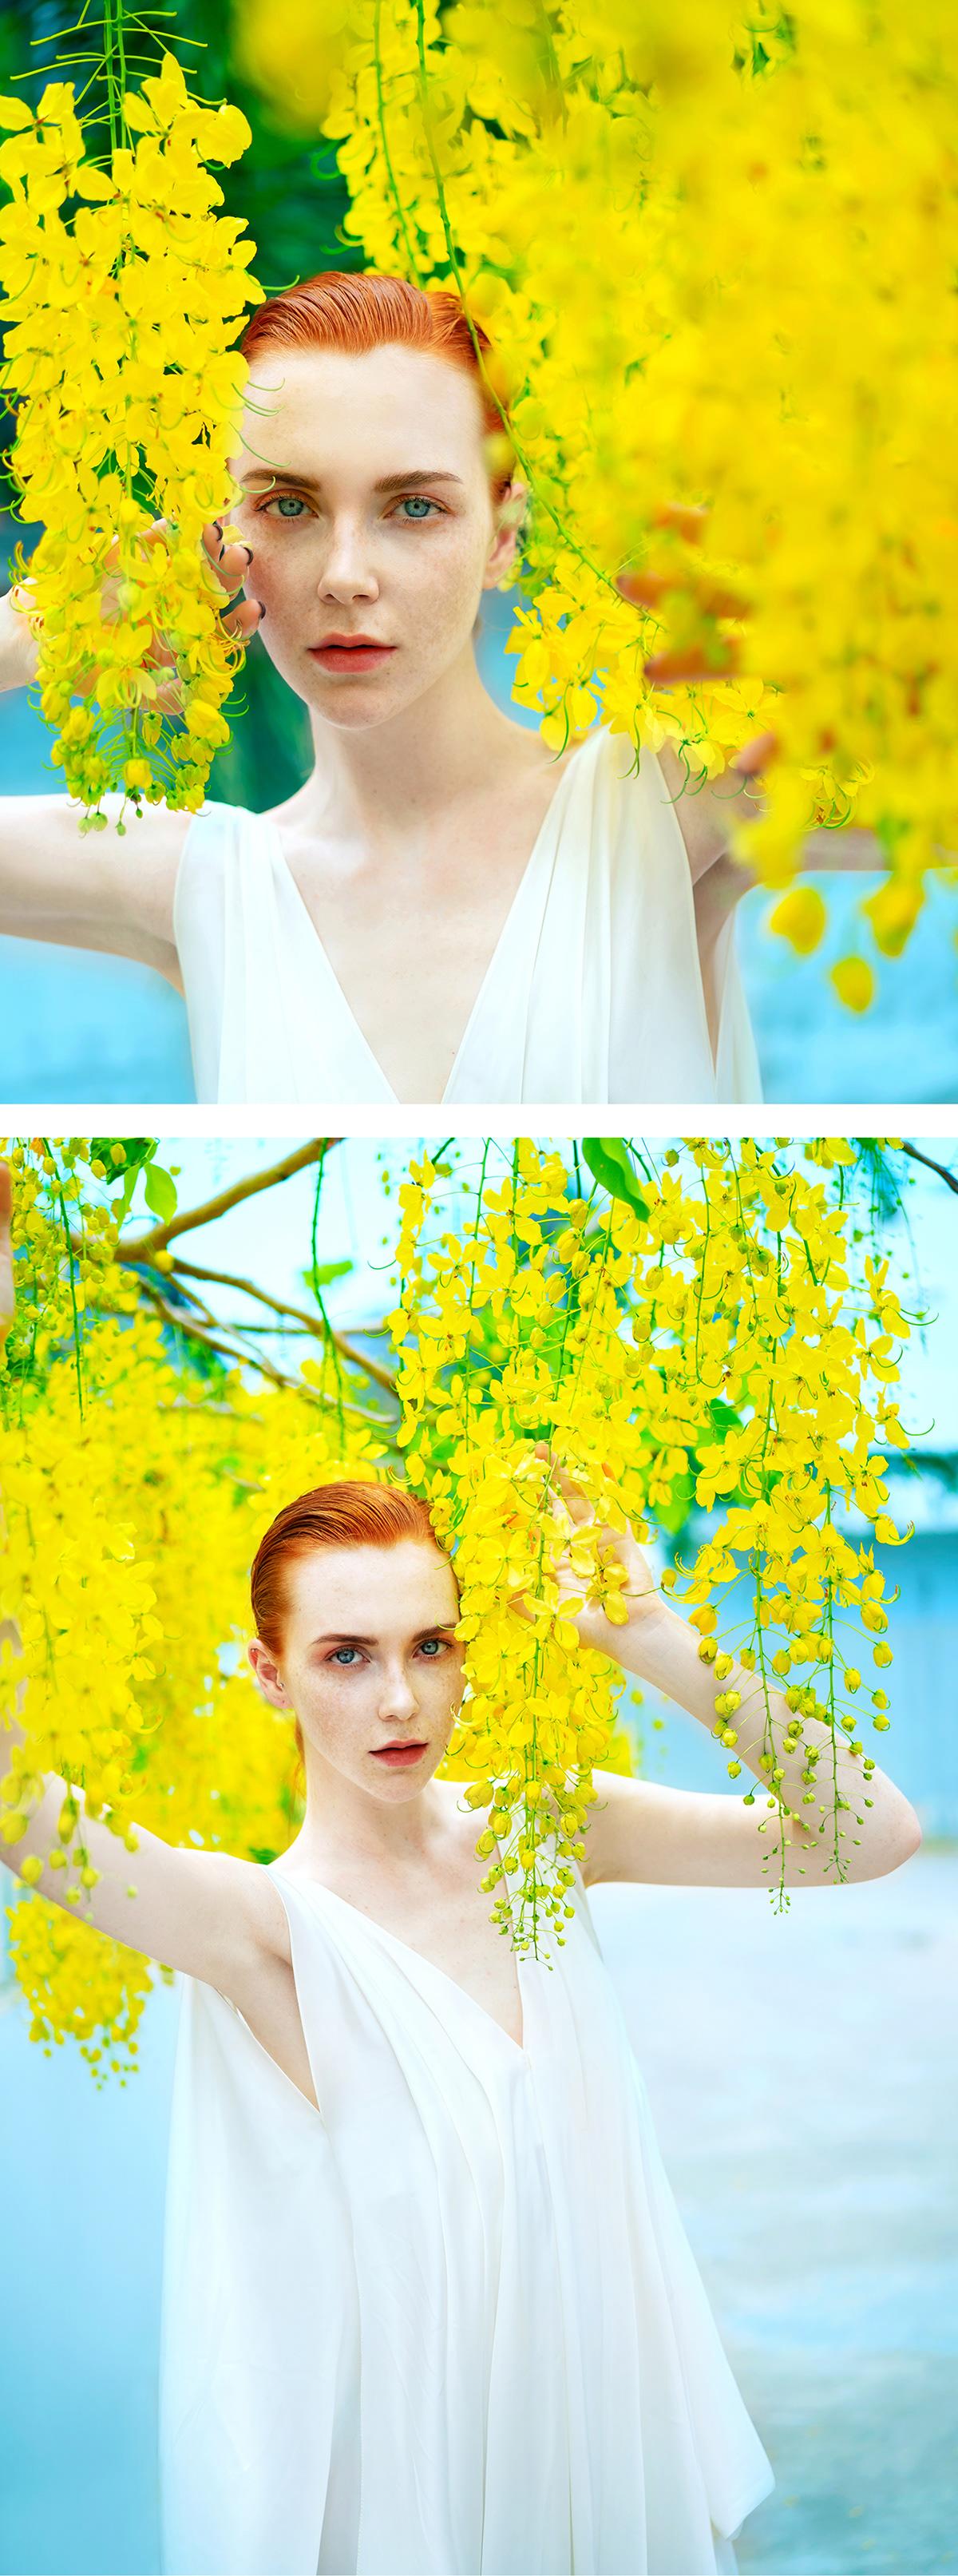 Golden island / фото Andrey Yakovlev Lili Aleeva